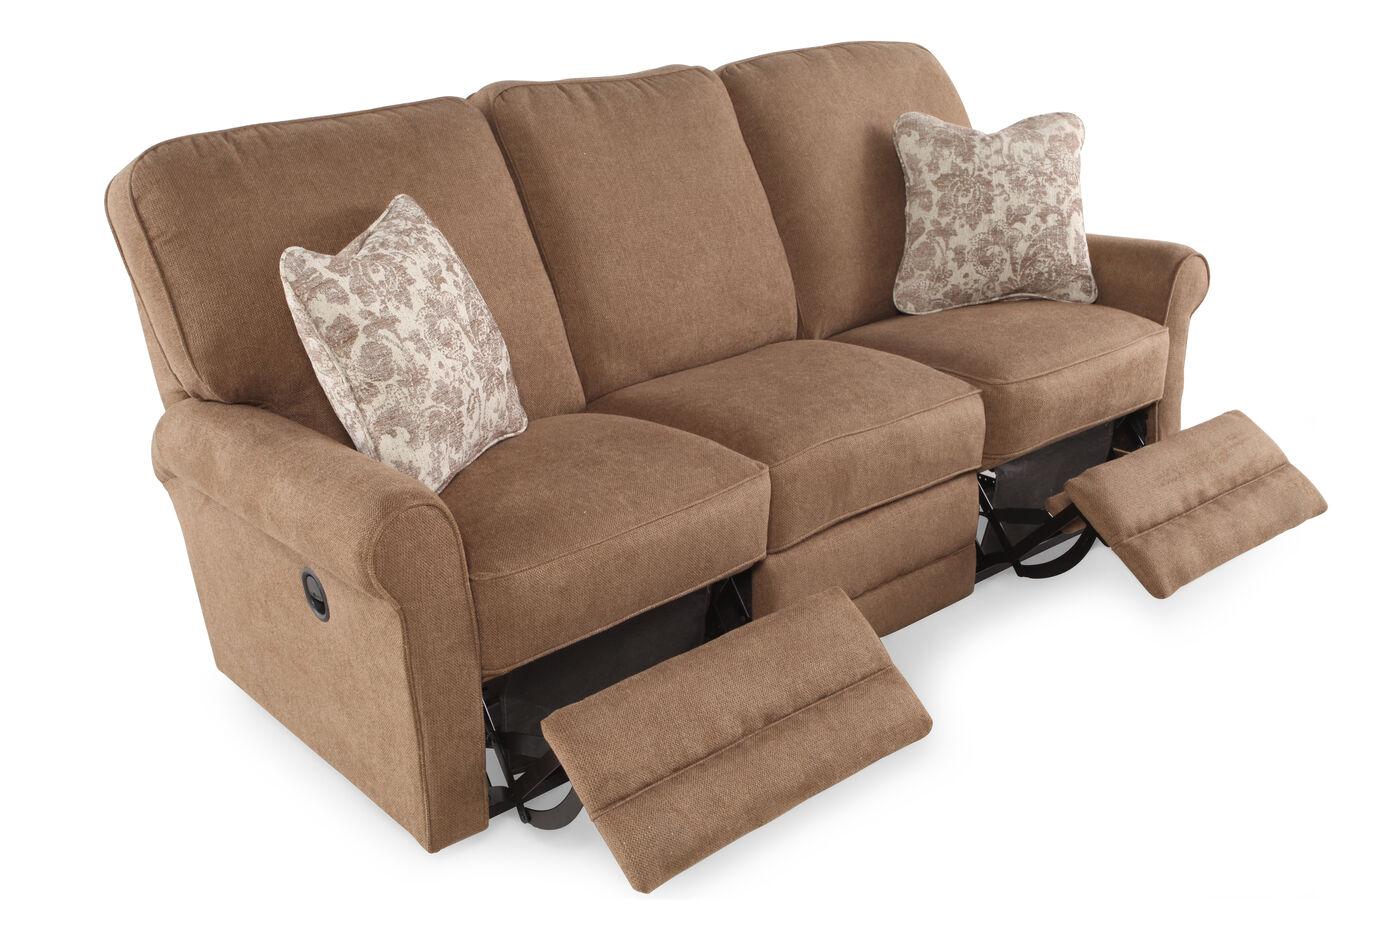 la hbre table sunbrella z boy breckenridge outdoor spectrum coffee with and piece n sofa cushion wicker couch p set ct sand sofas